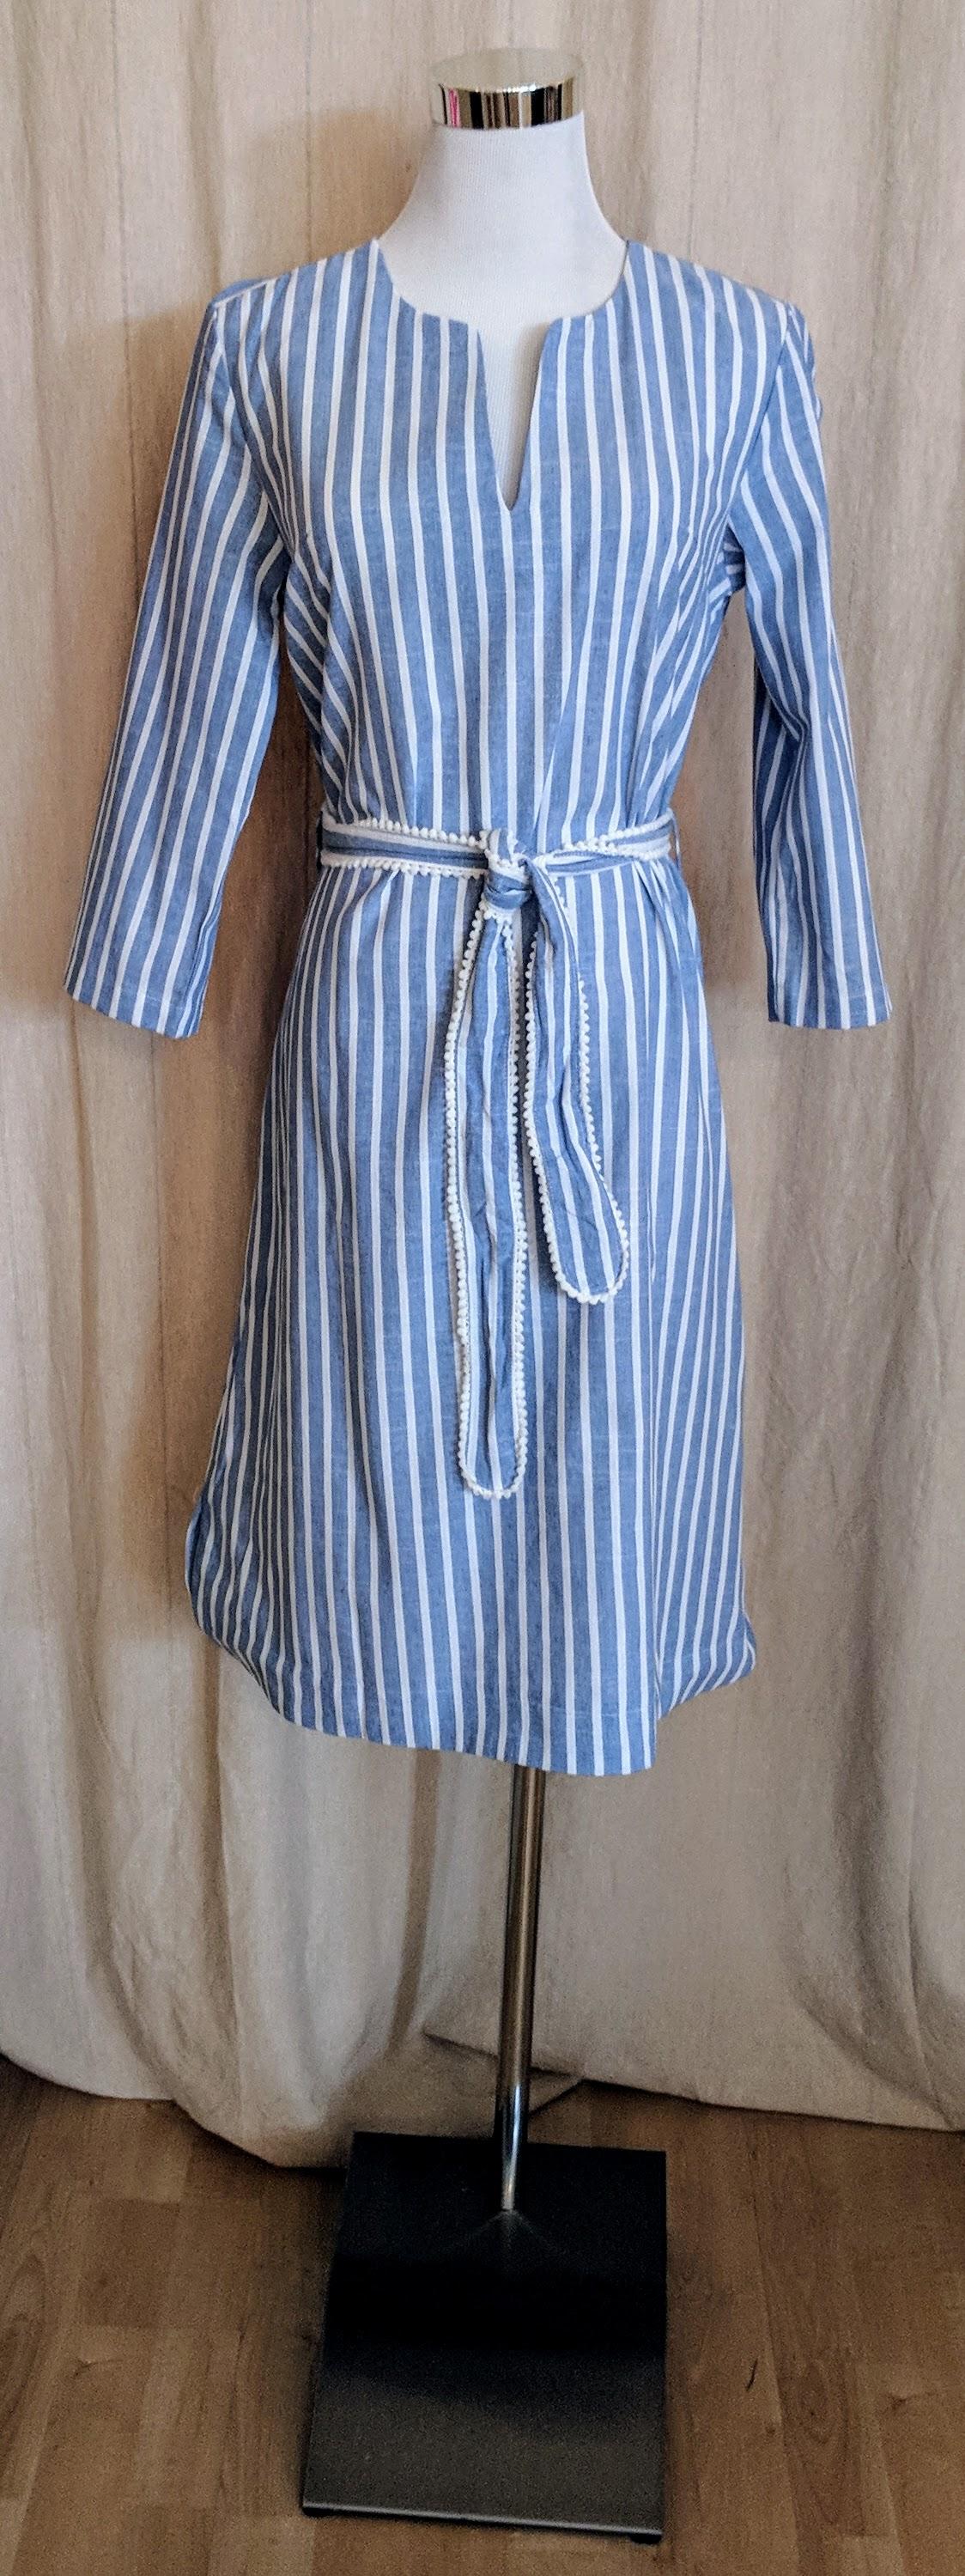 Blue stripe flare dress with boat neckline.